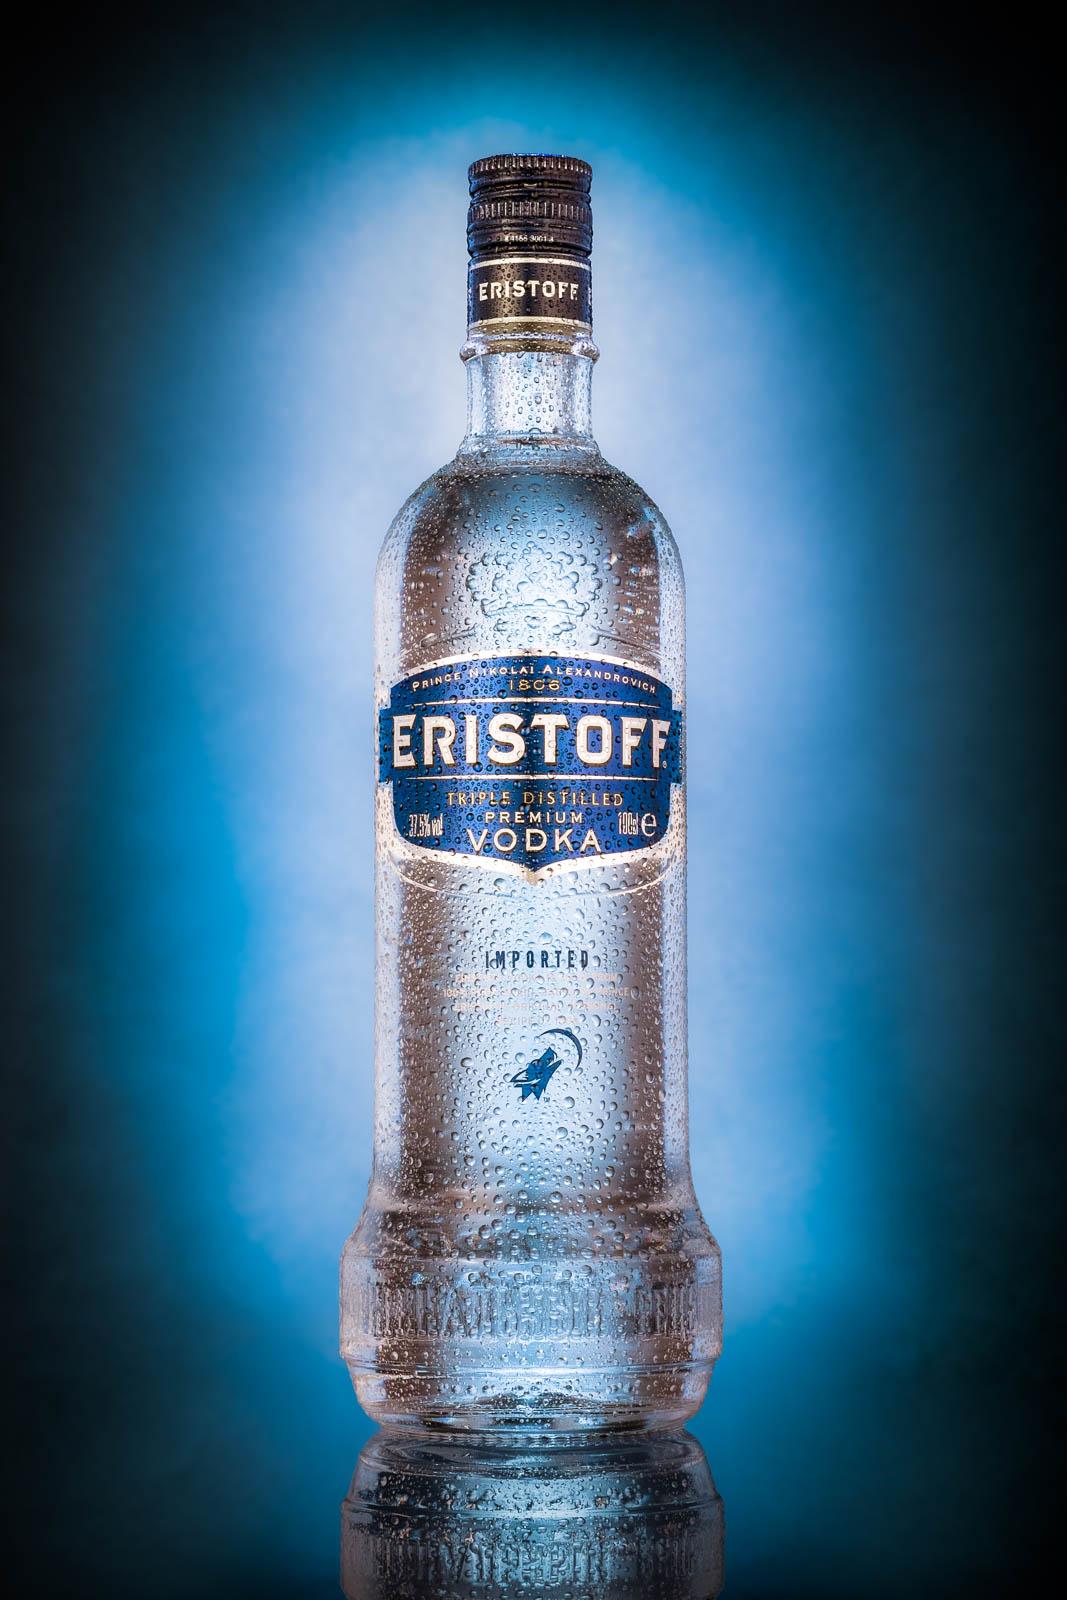 Eristoff vodka bottle